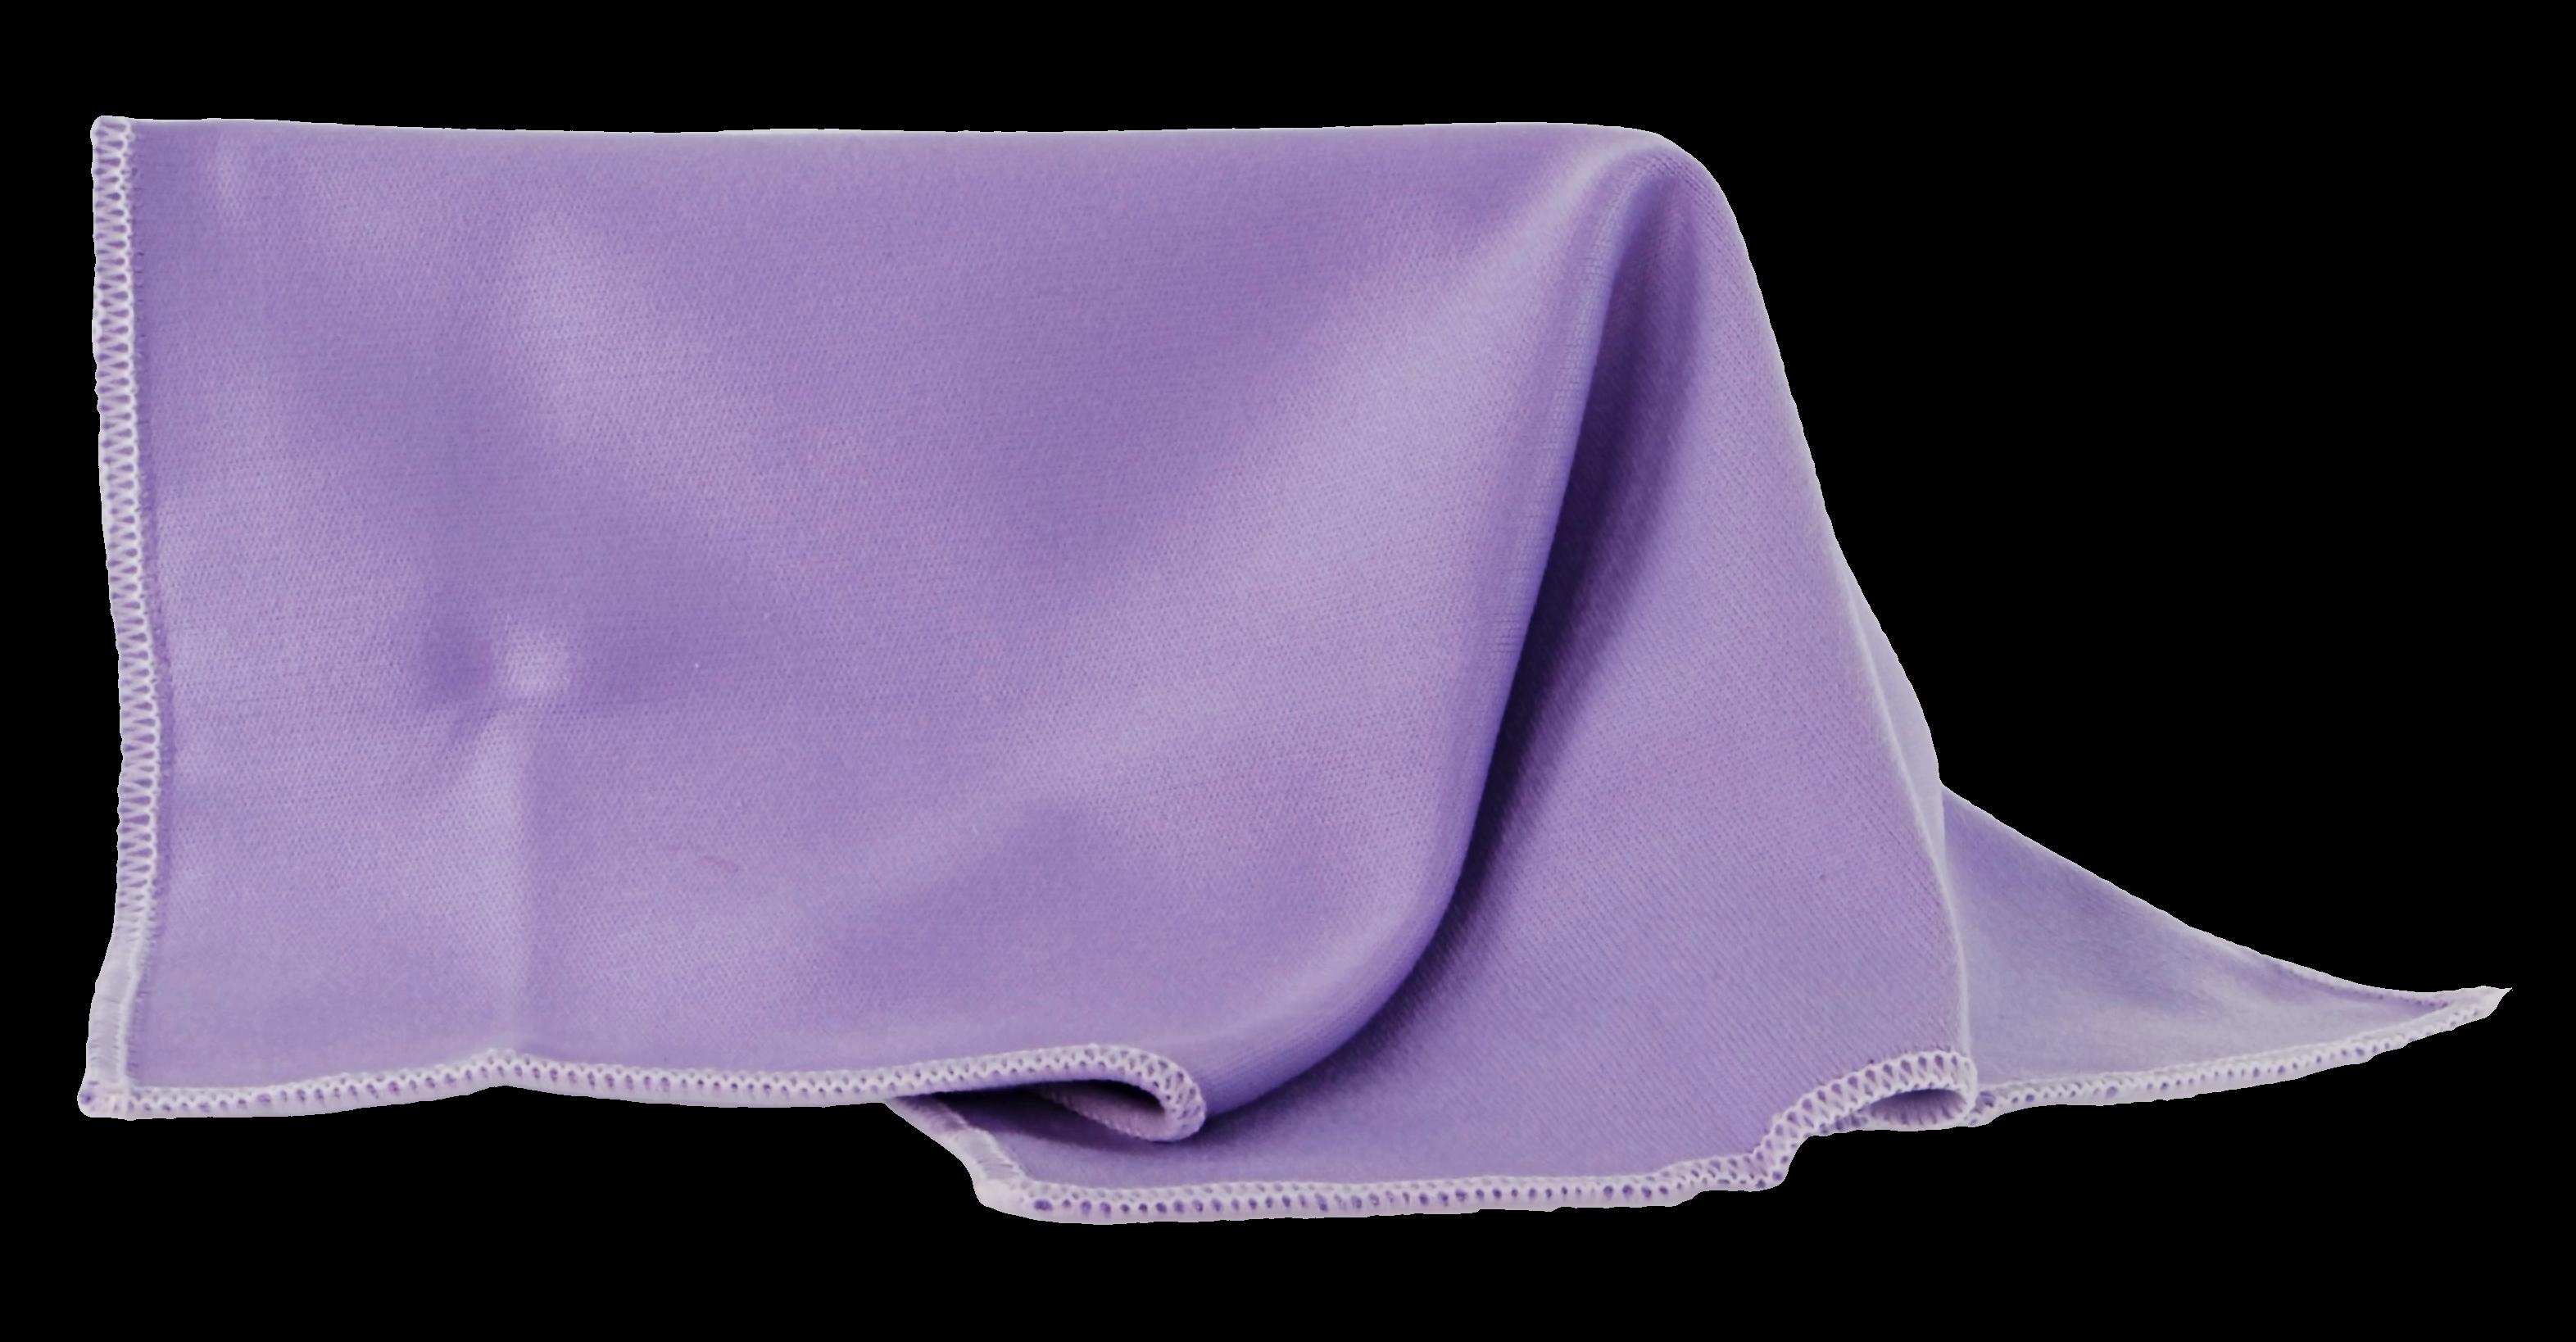 Brillenputztuch lila